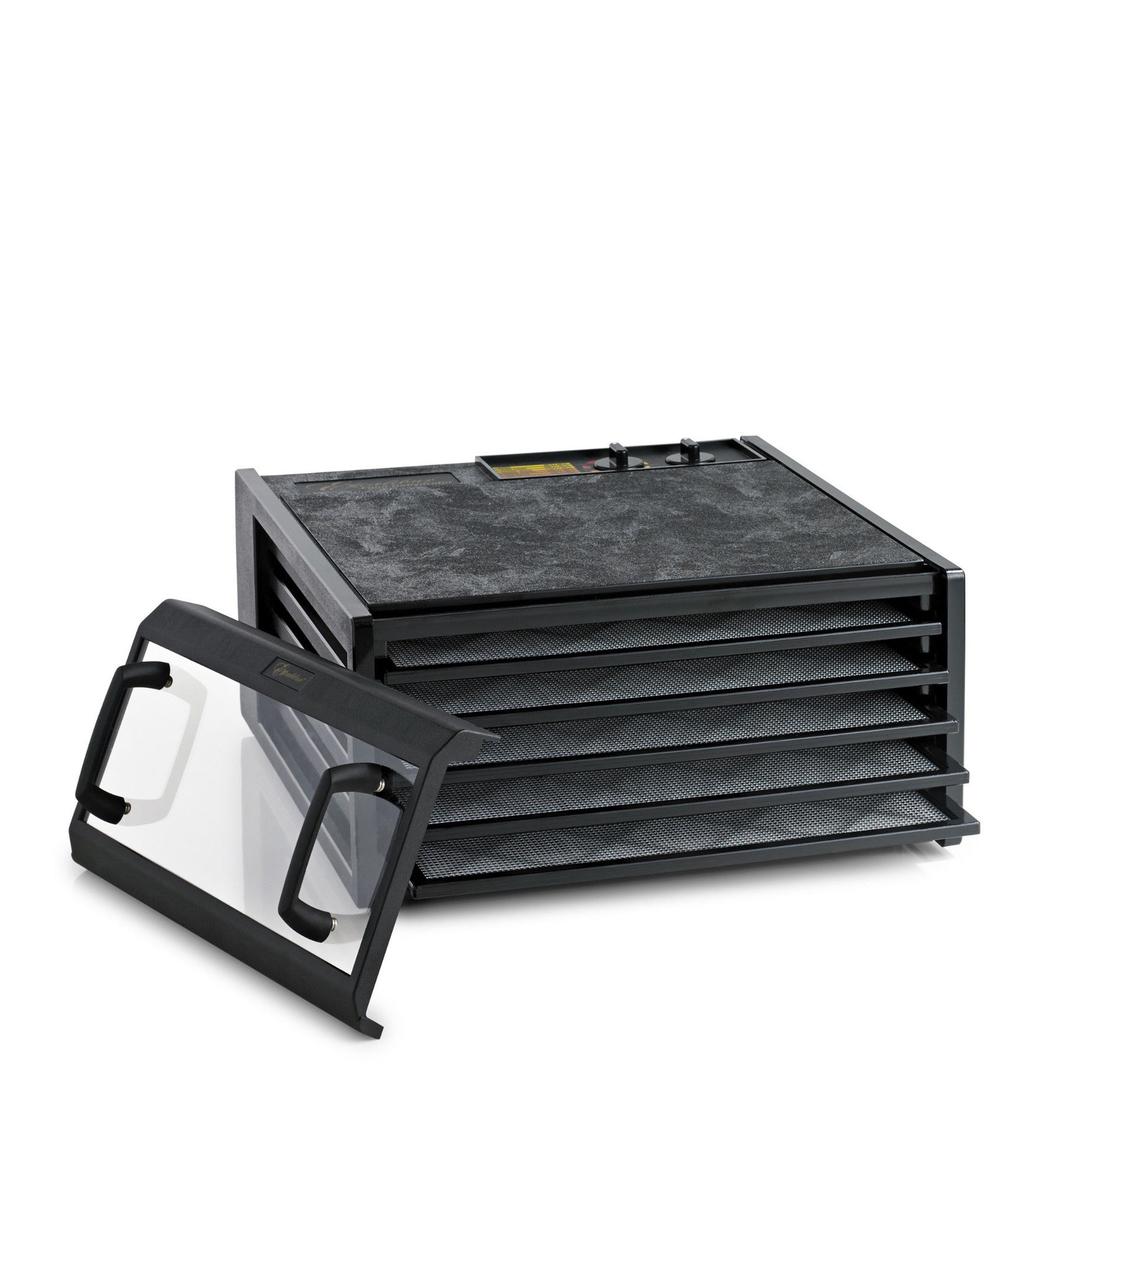 excalibur food dehydrator black 5 tray price breaker. Black Bedroom Furniture Sets. Home Design Ideas